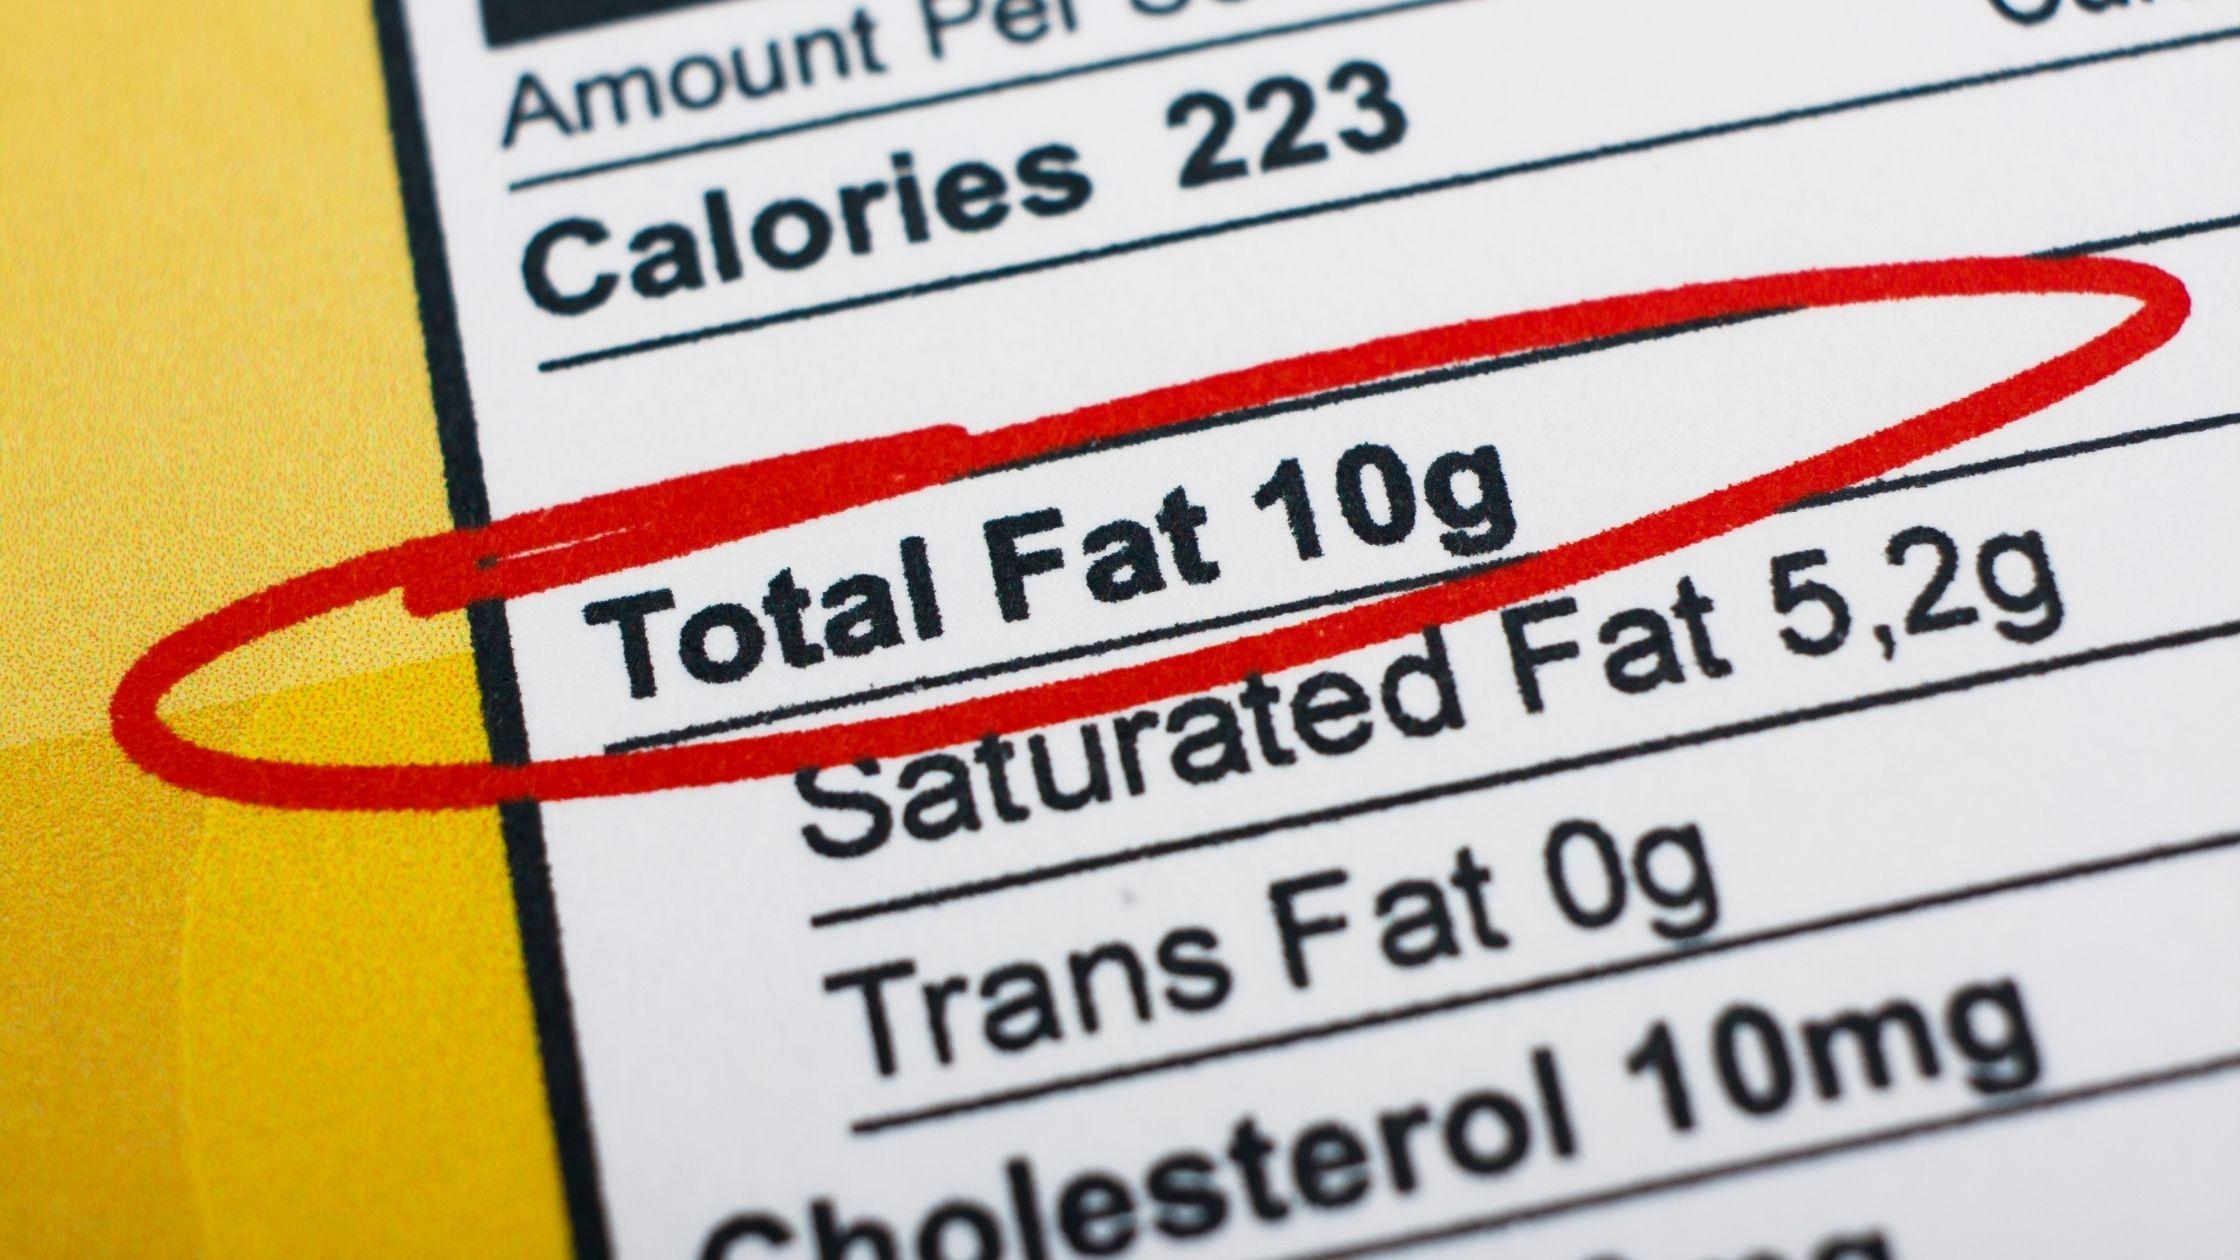 high-fat food